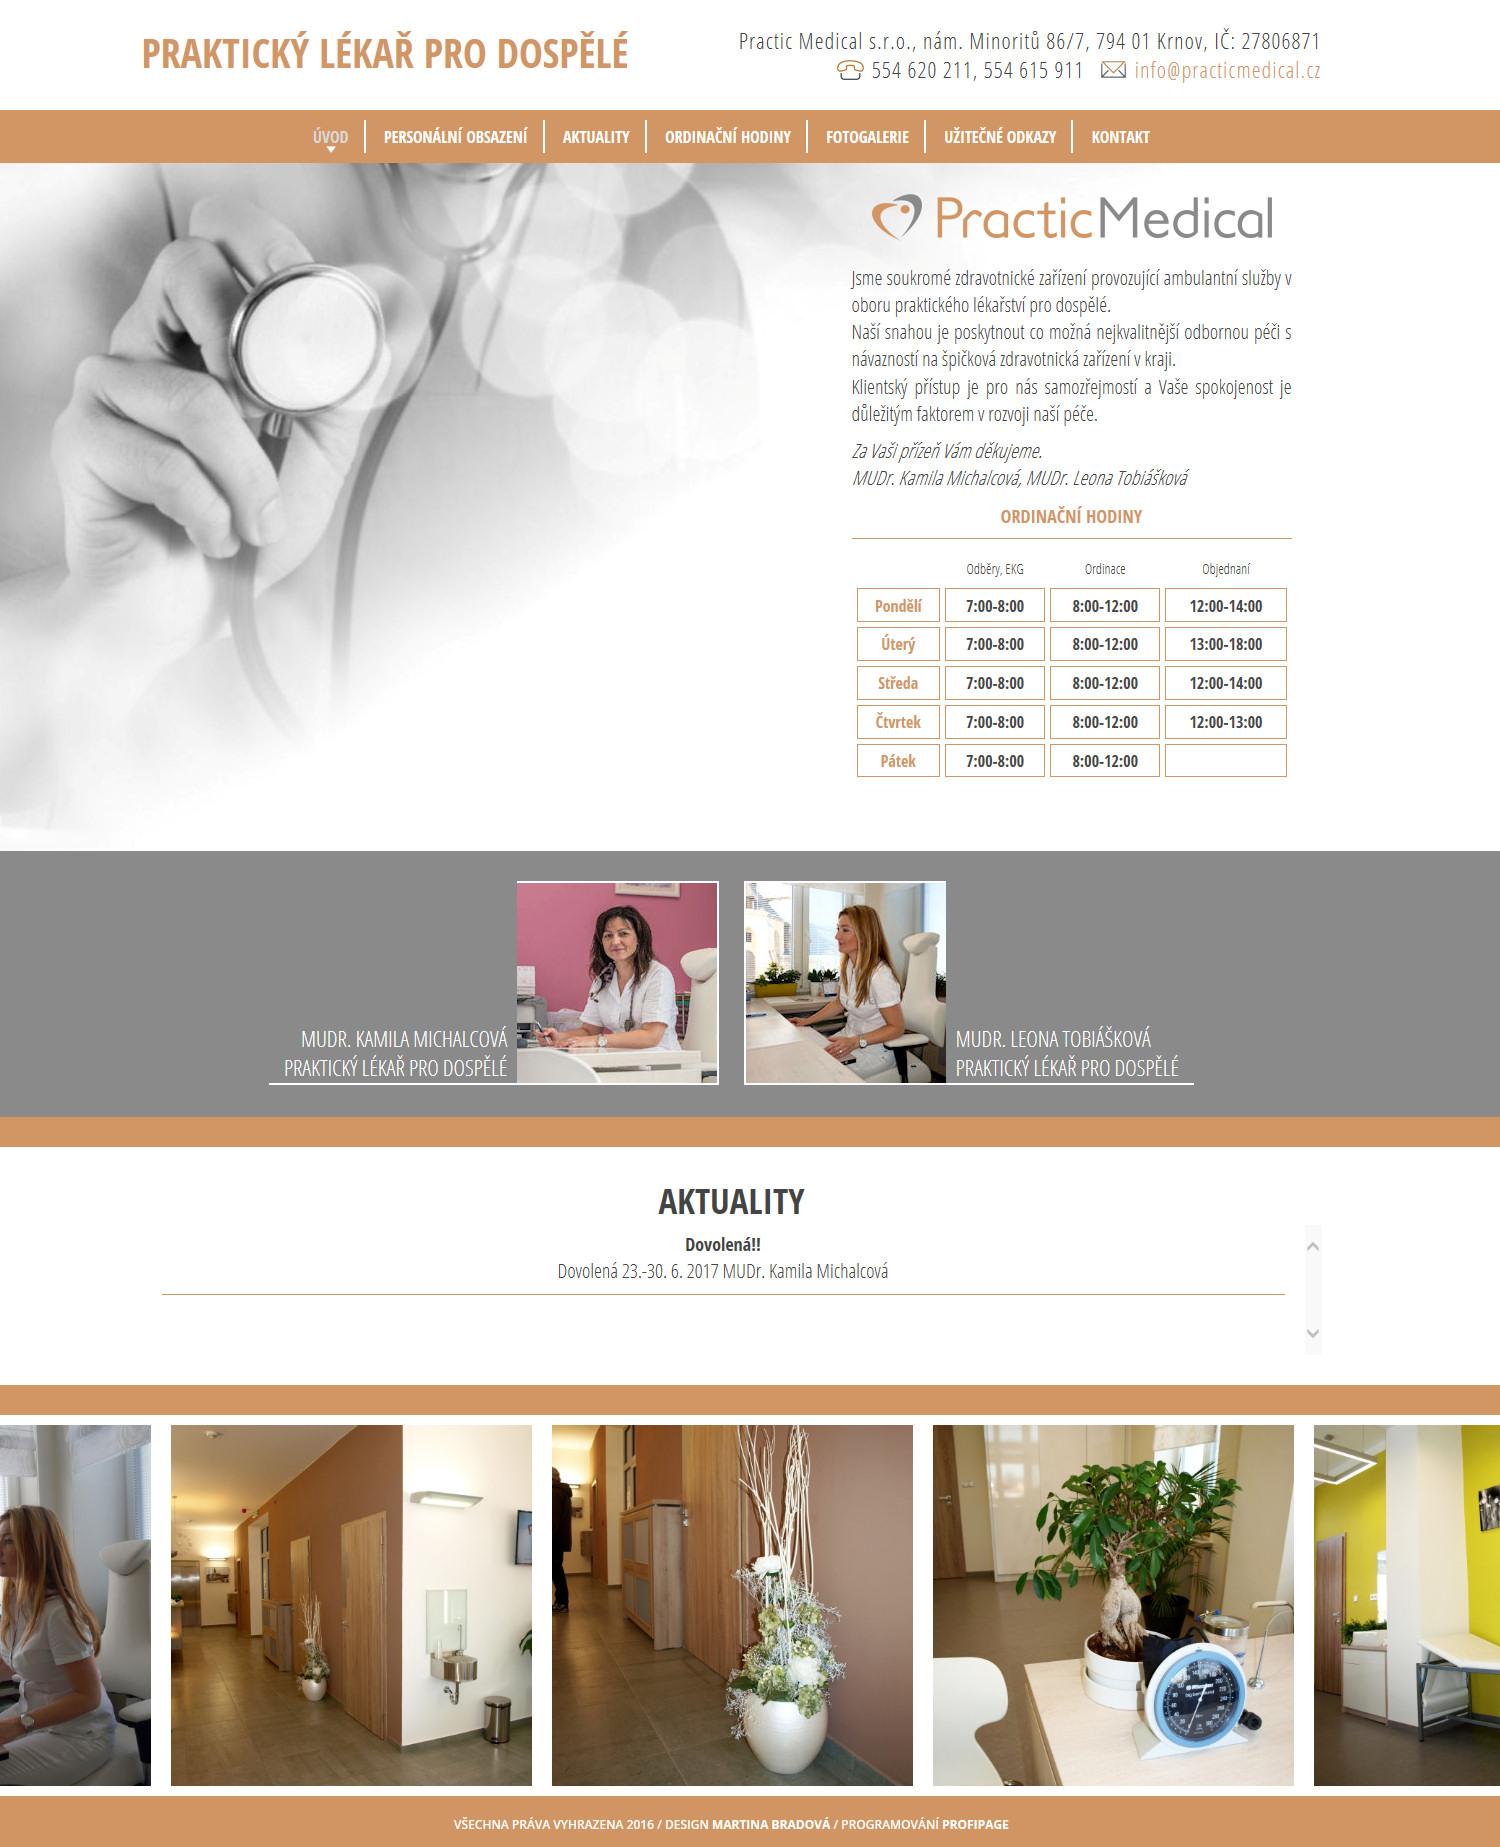 Practic Medical